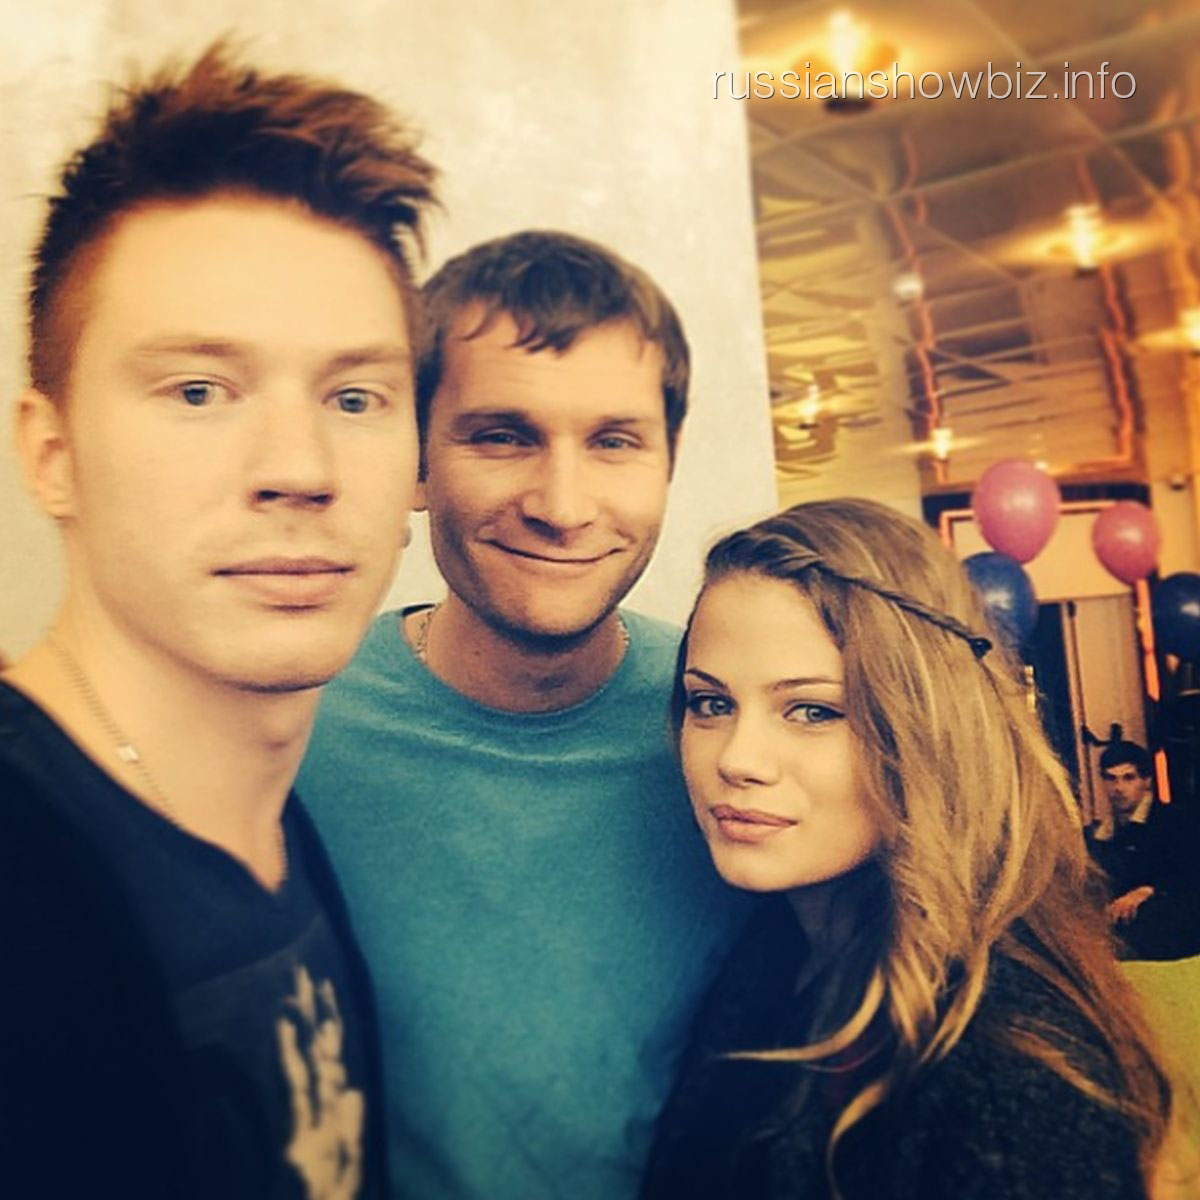 Никита Пресняков, Николай Наумов и Алена Краснова